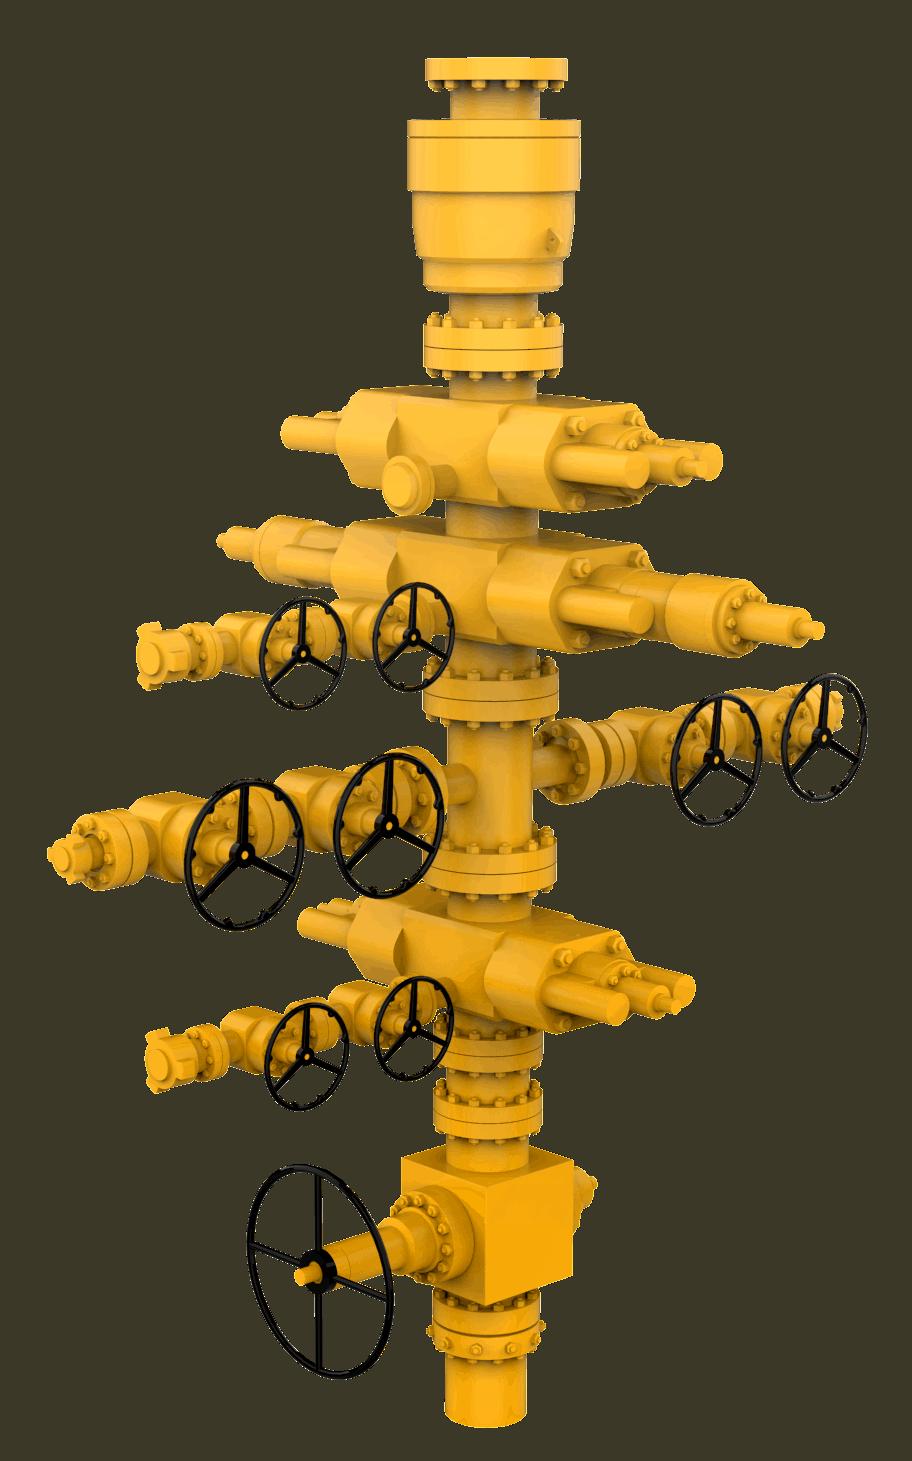 ranger energy services bop stack